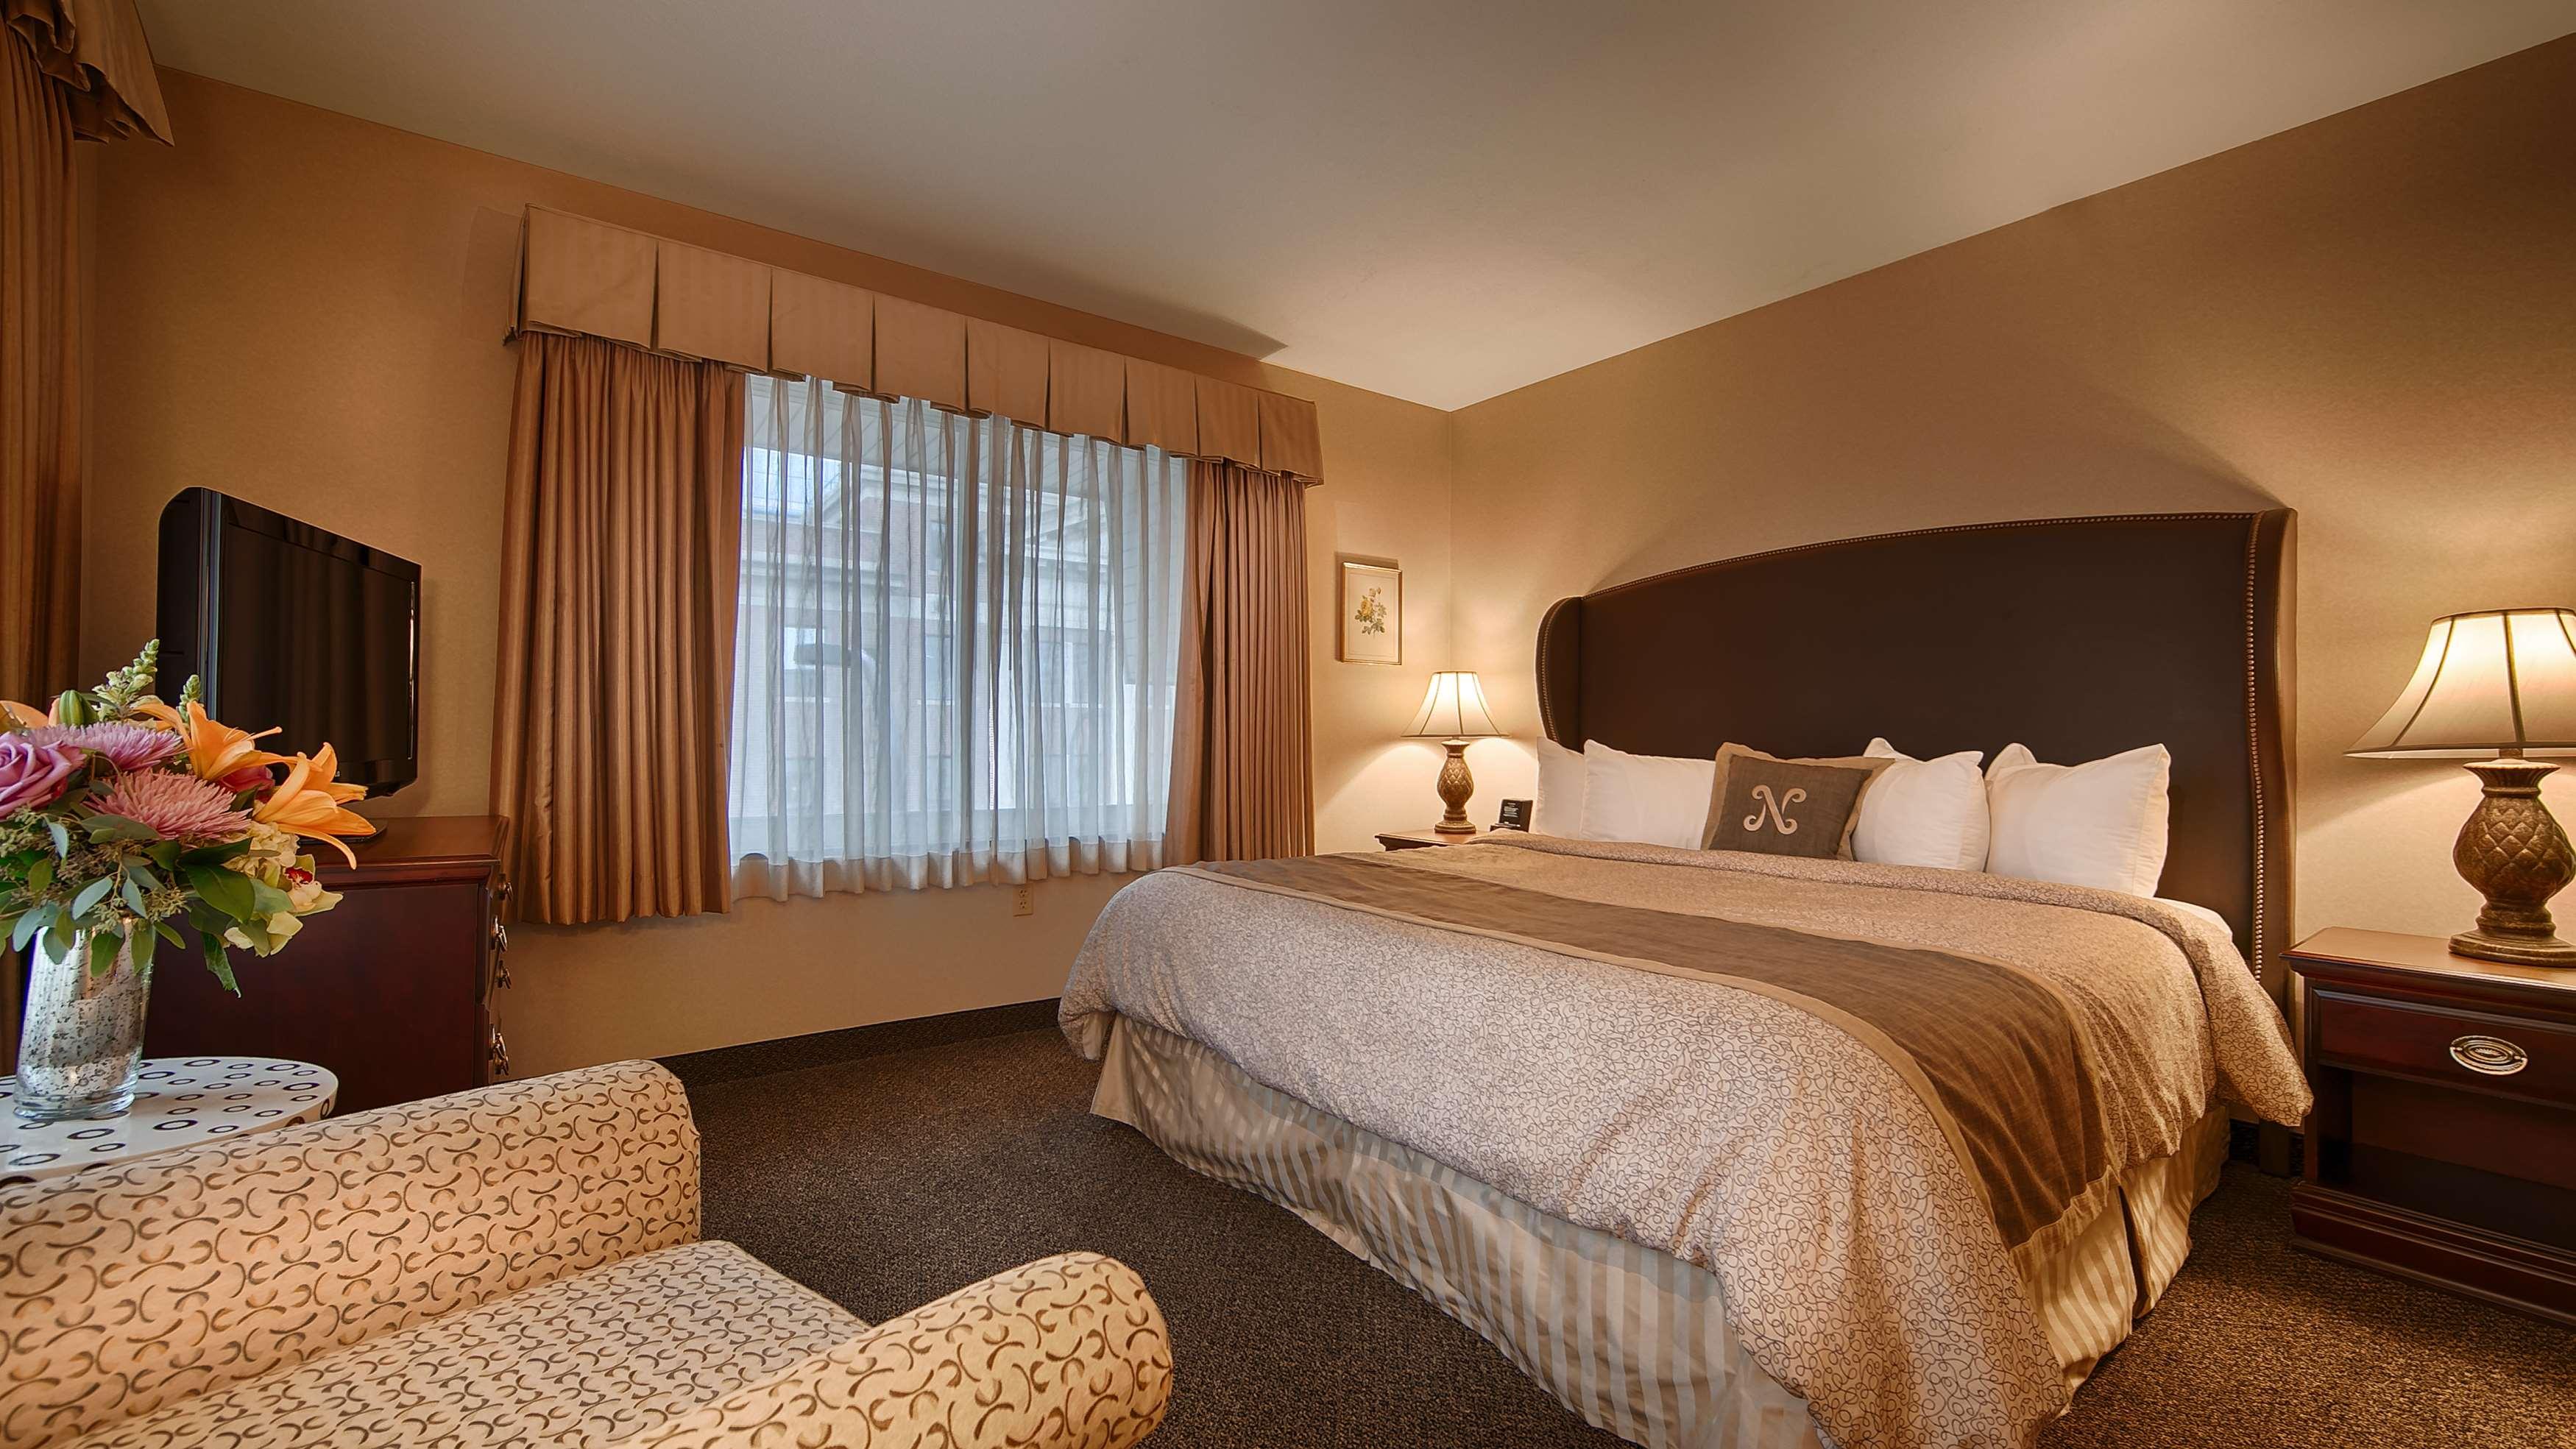 Best Western Plus The Normandy Inn & Suites image 5